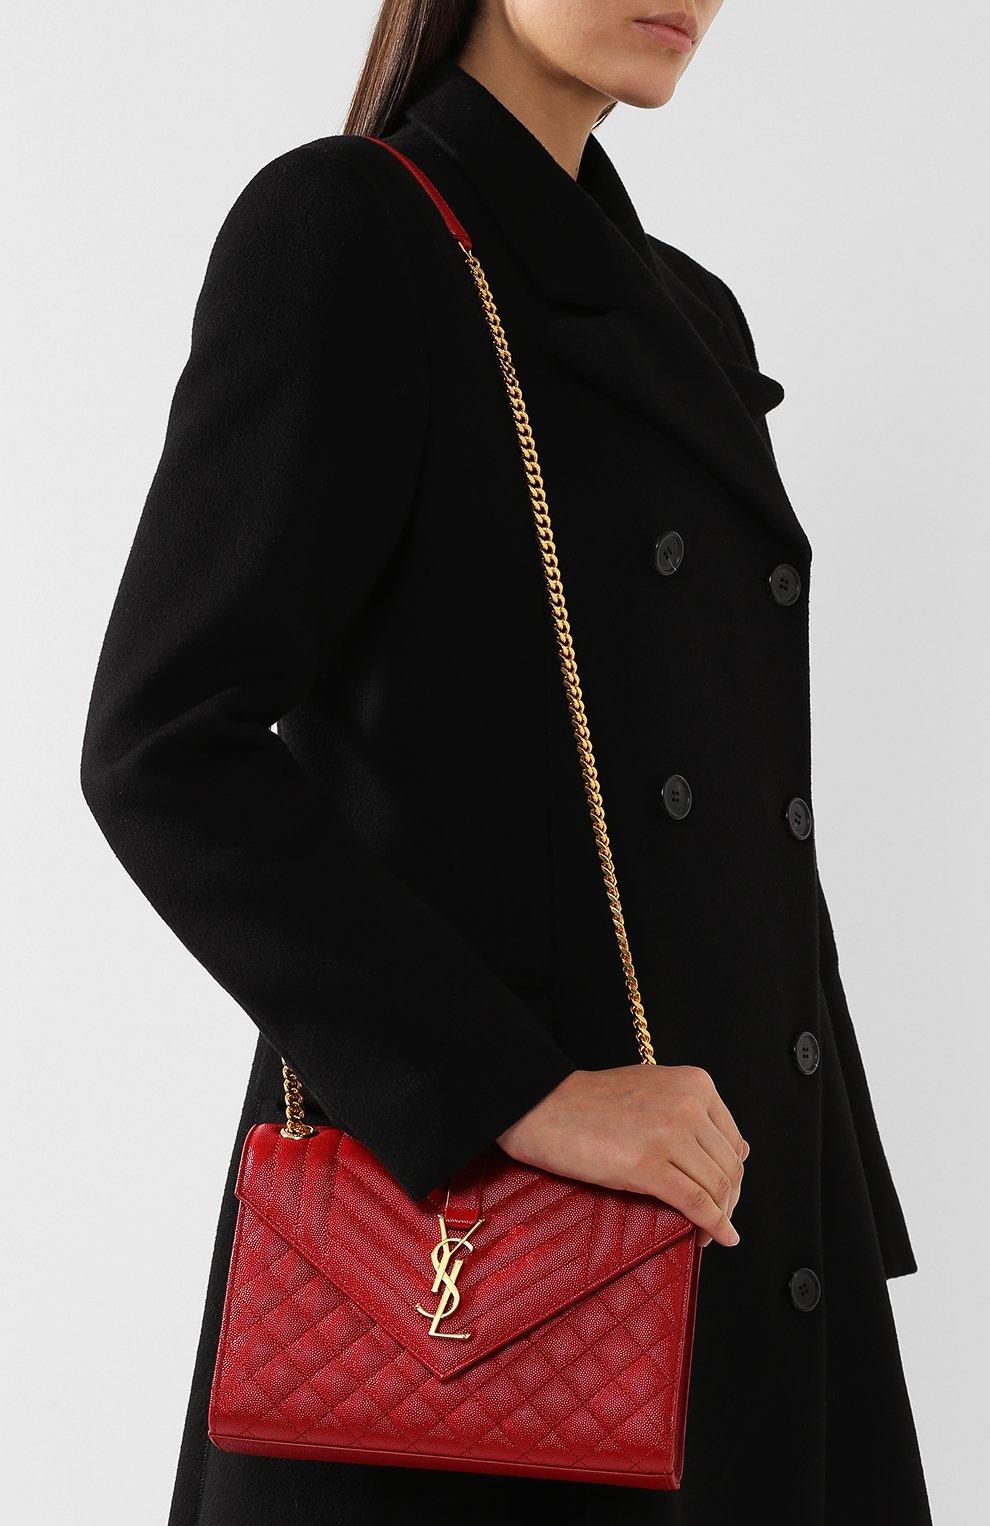 Сумка Classic Monogram medium Saint Laurent красная цвета | Фото №5